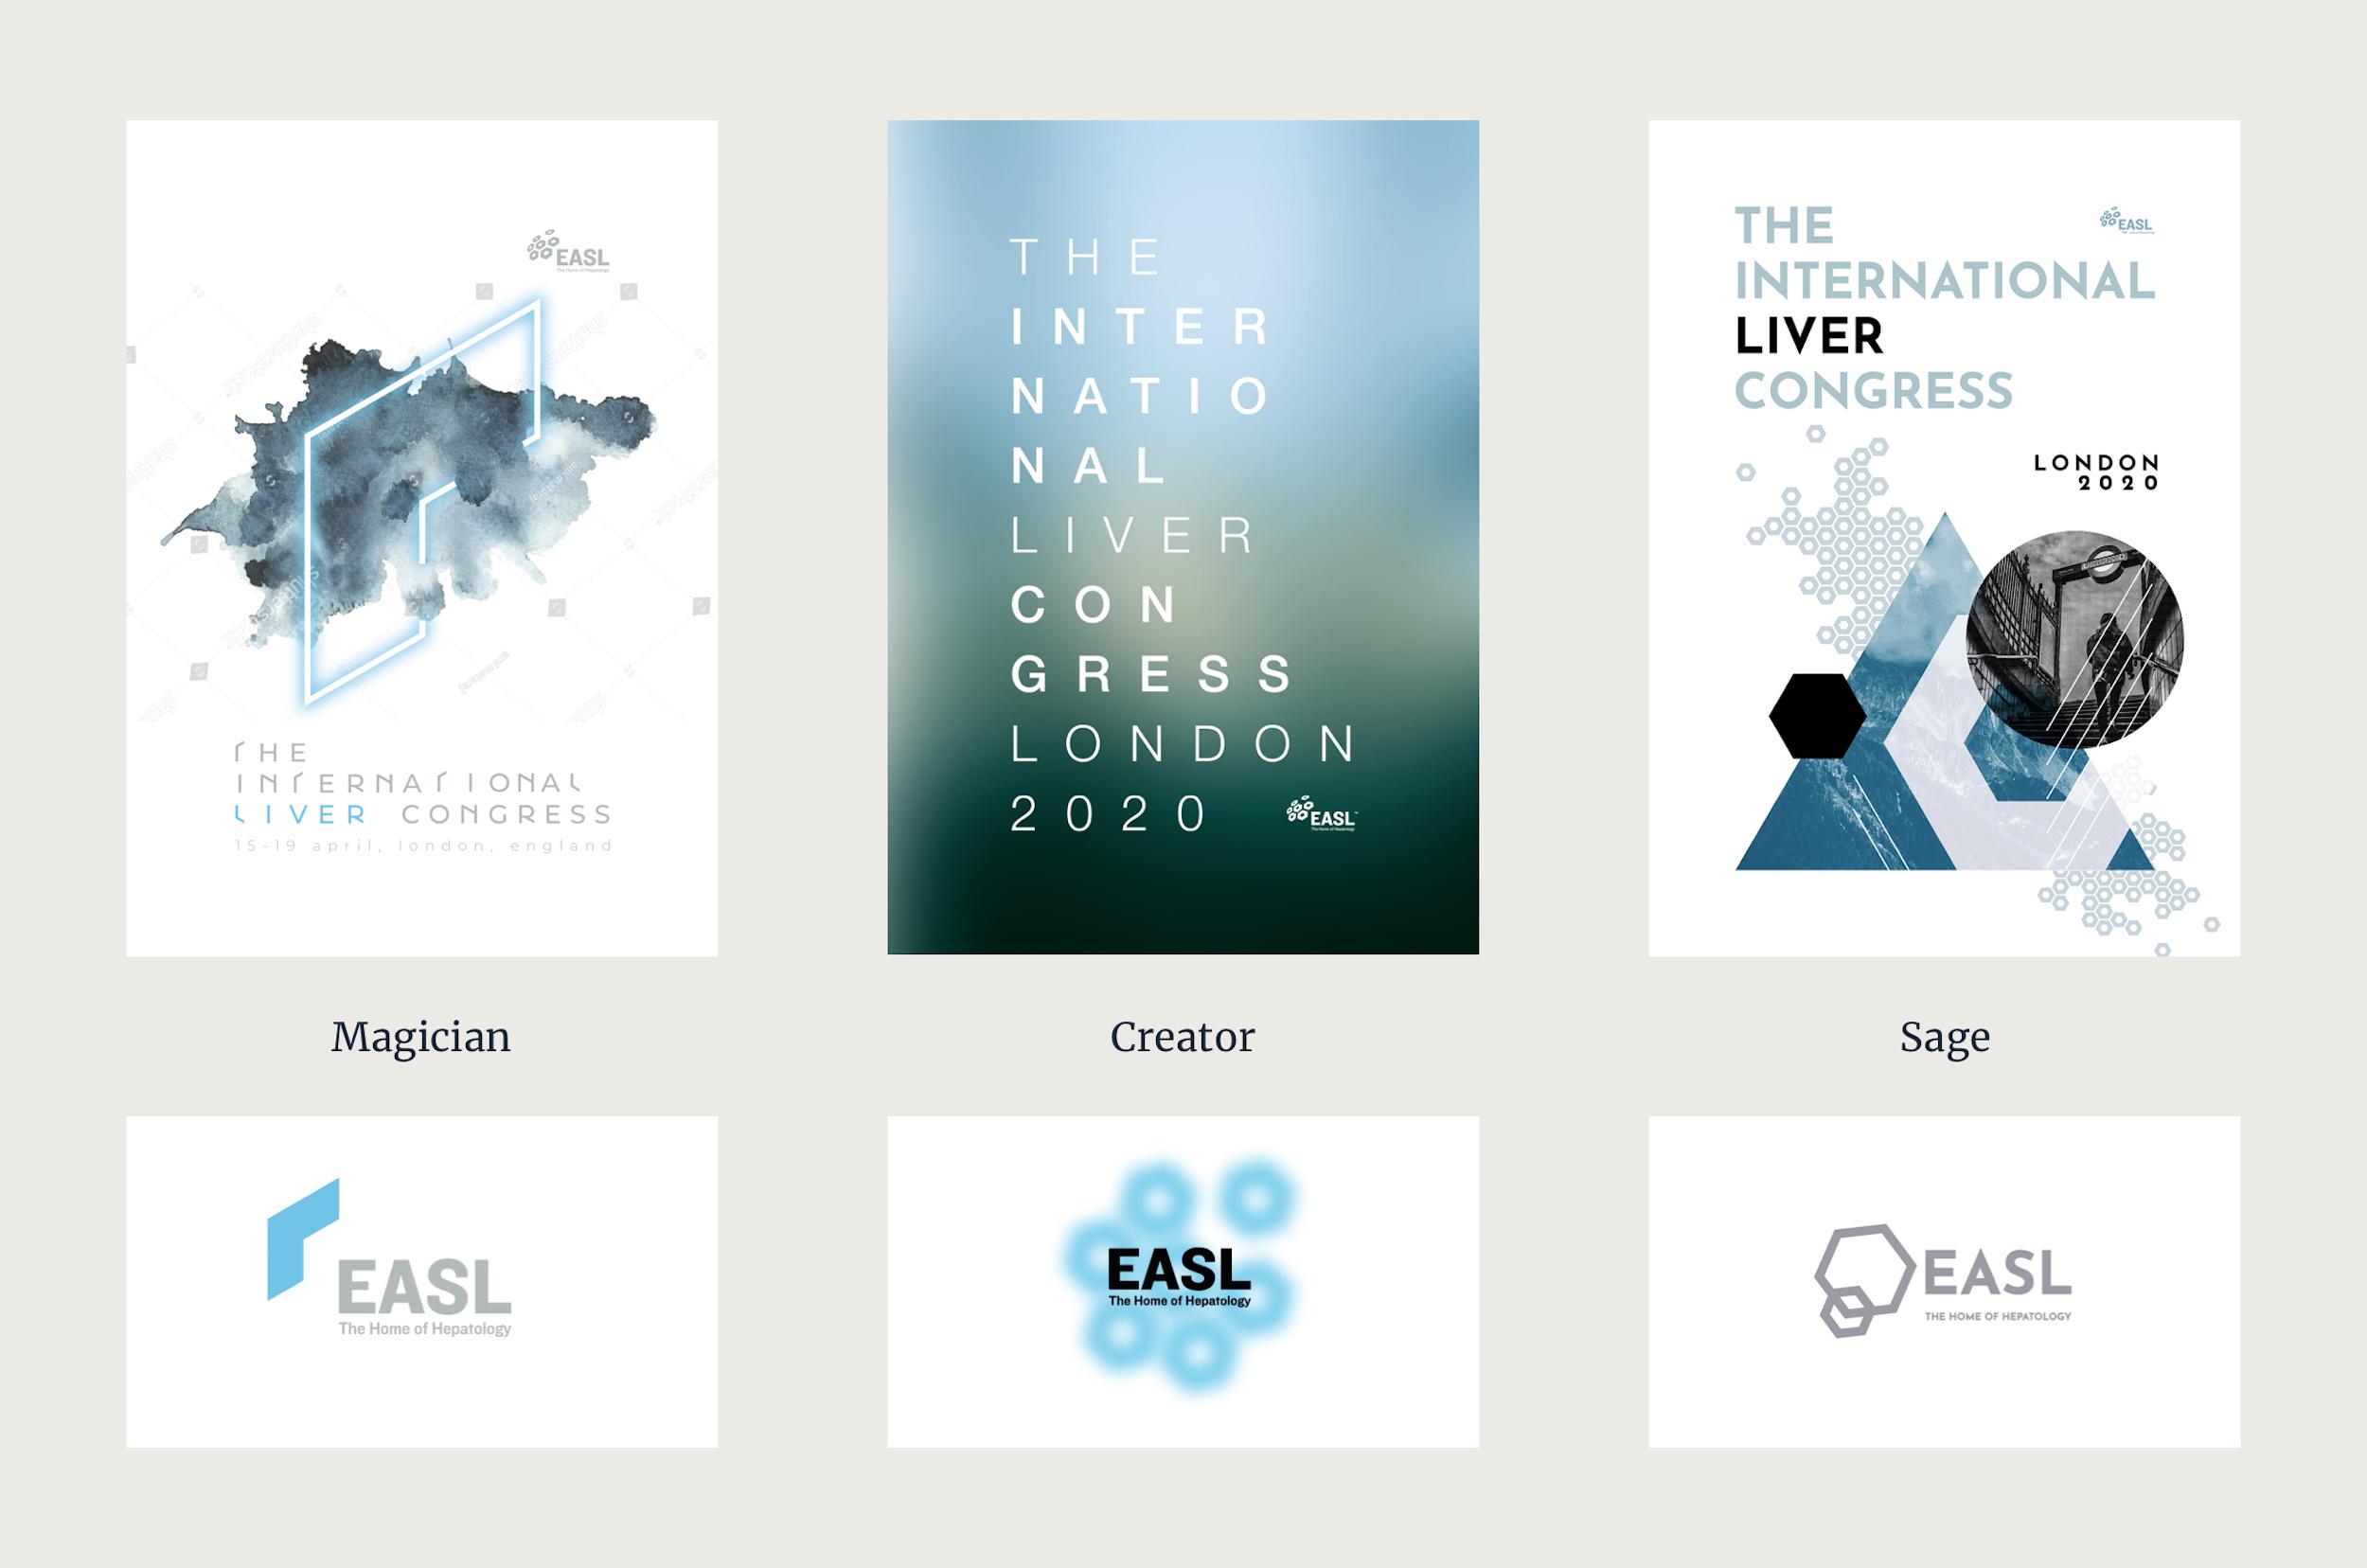 EASL casestudy 1